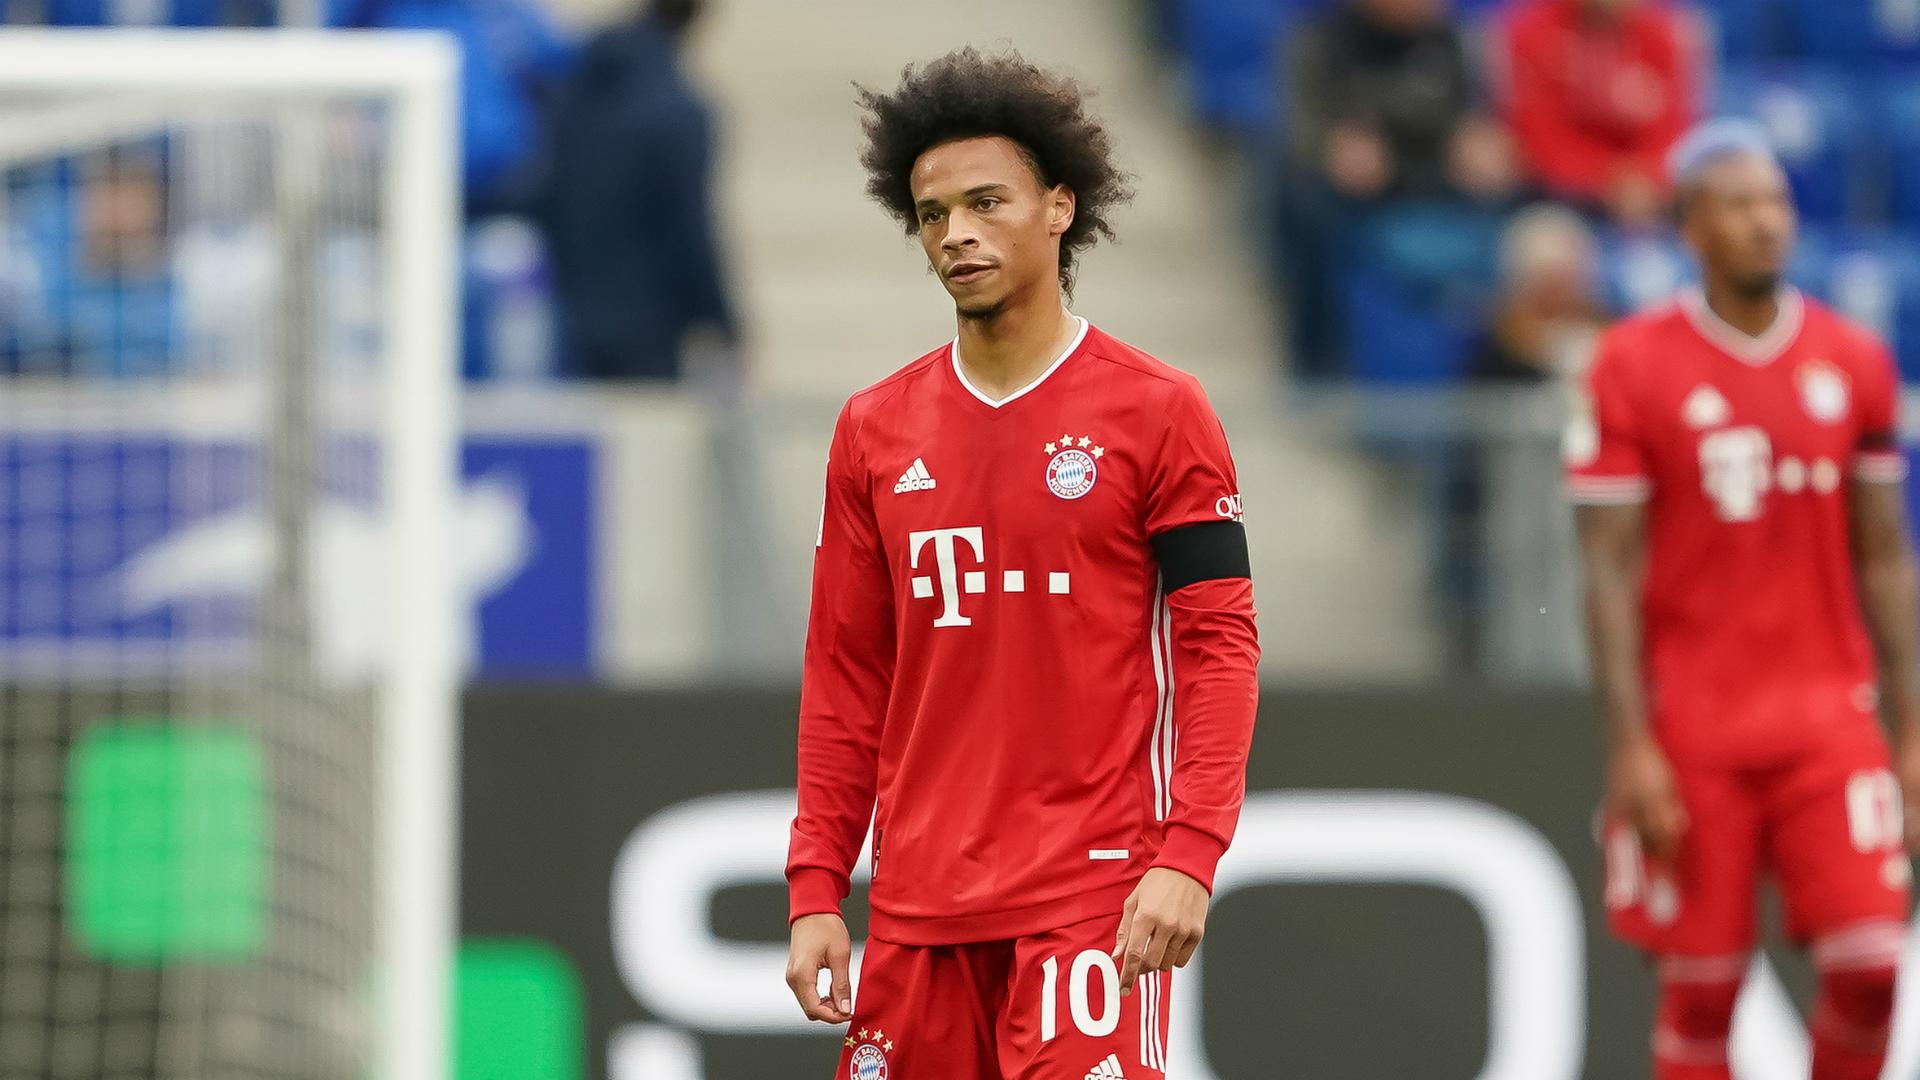 Bayern winger Sane ruled out of DFL-Supercup against Dortmund